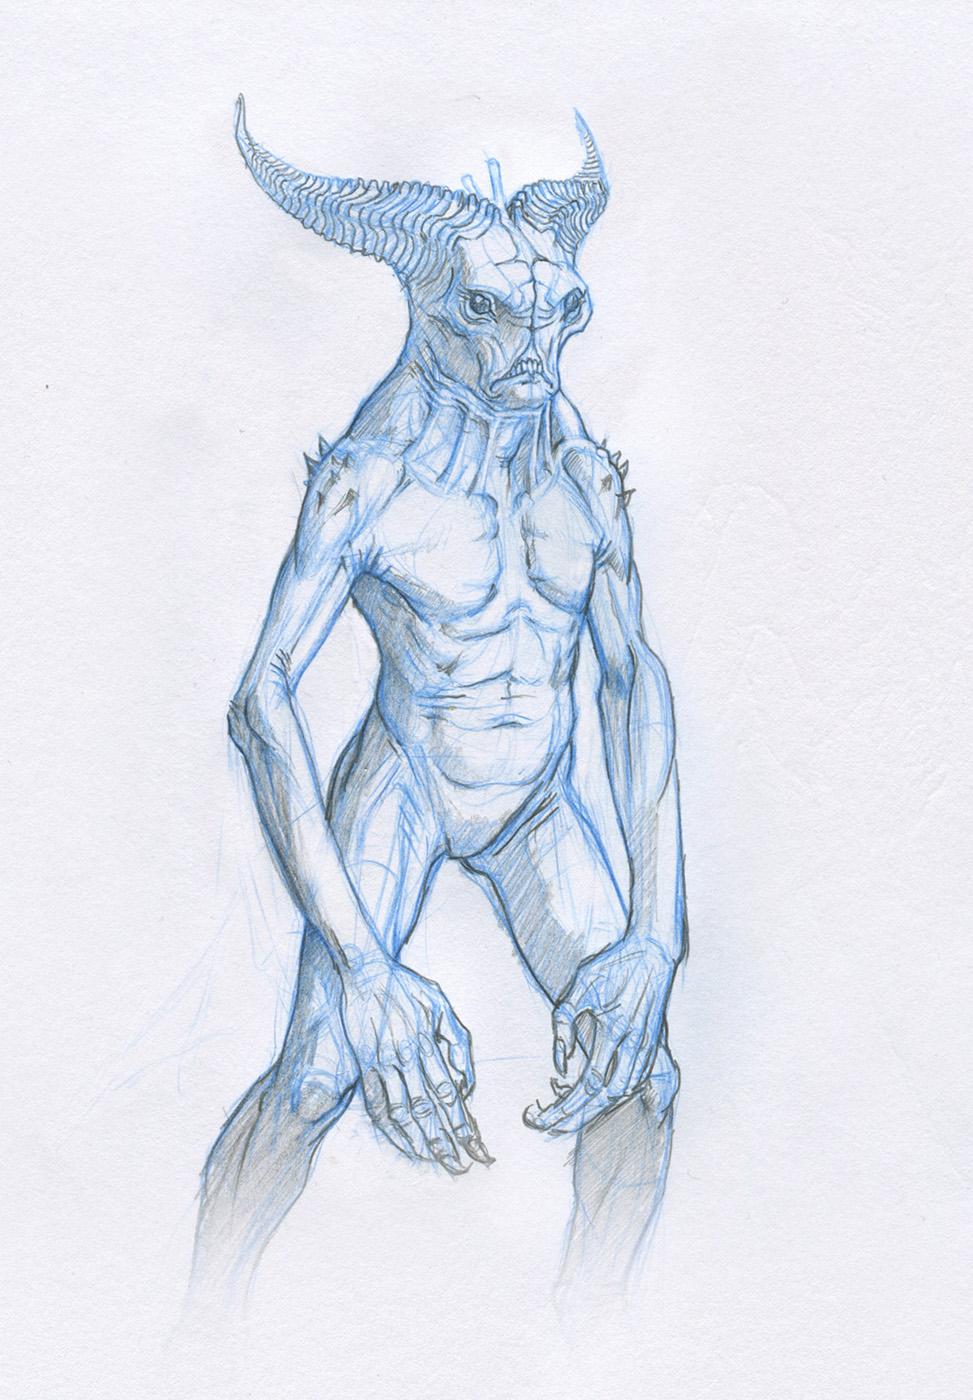 demon sketch by Mavros-Thanatos